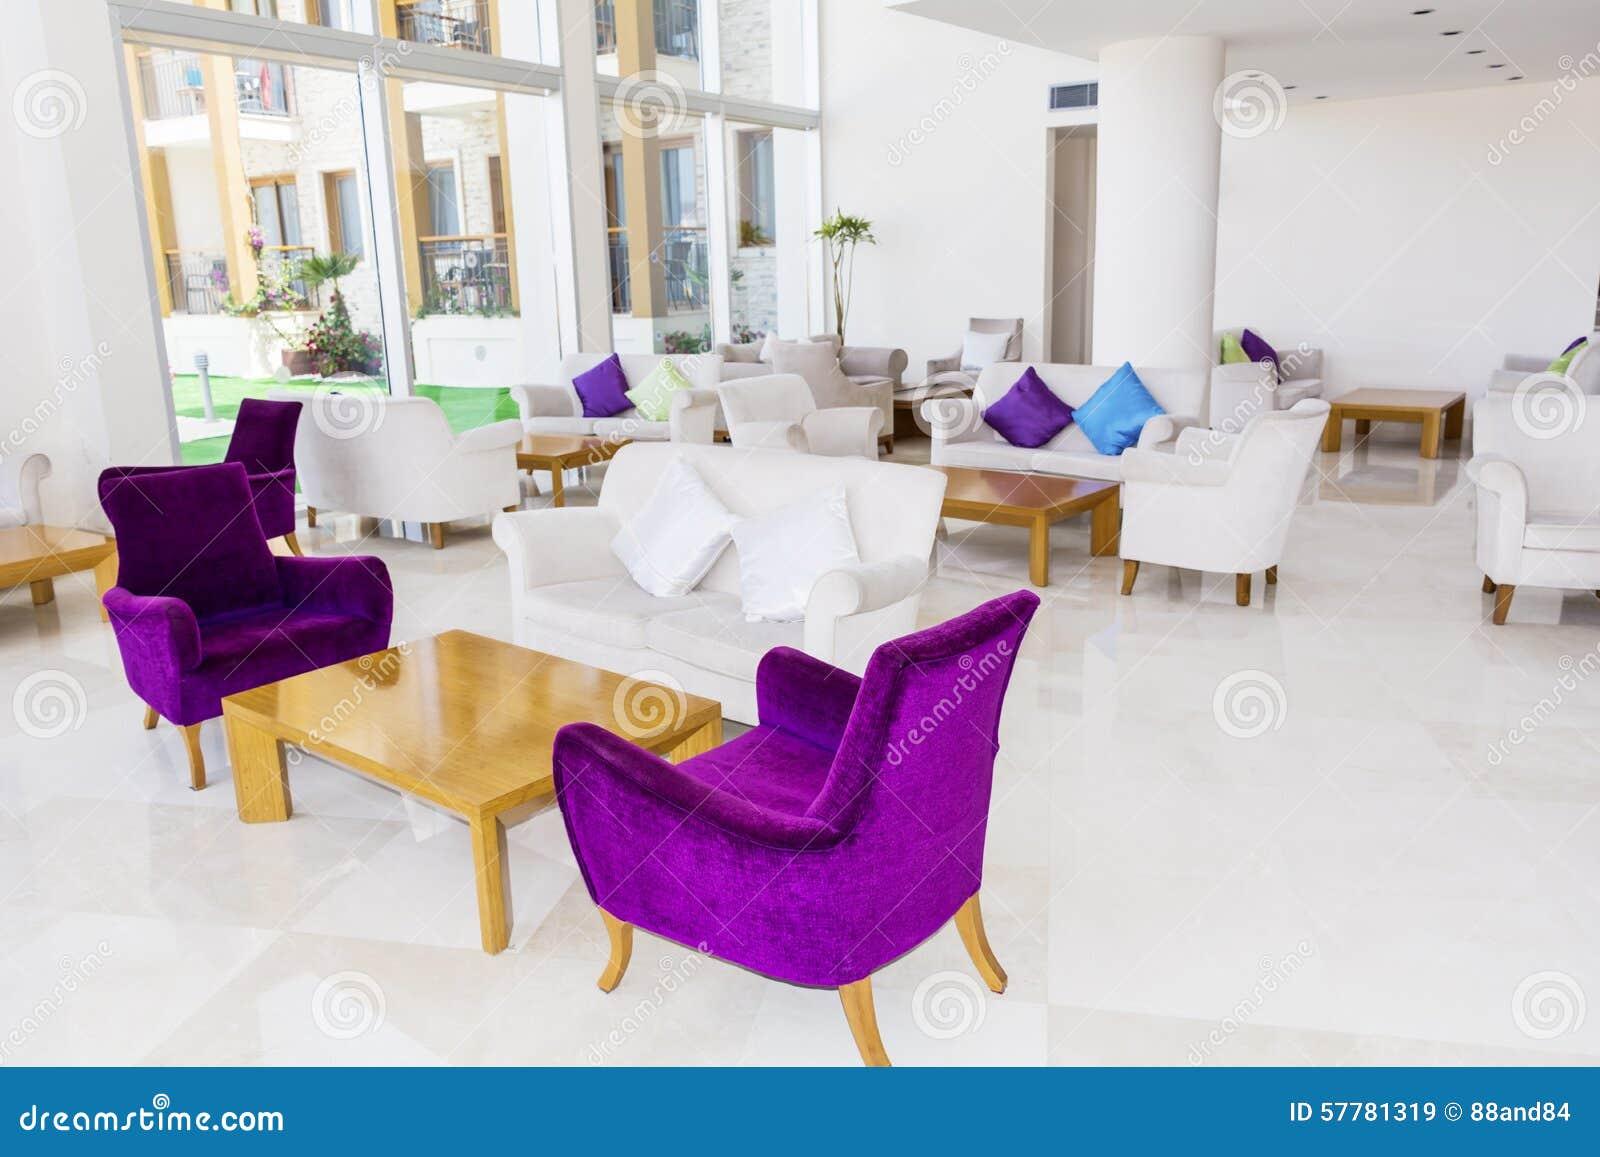 Modern Interior Design Of A Hotel Lobby Stock Image